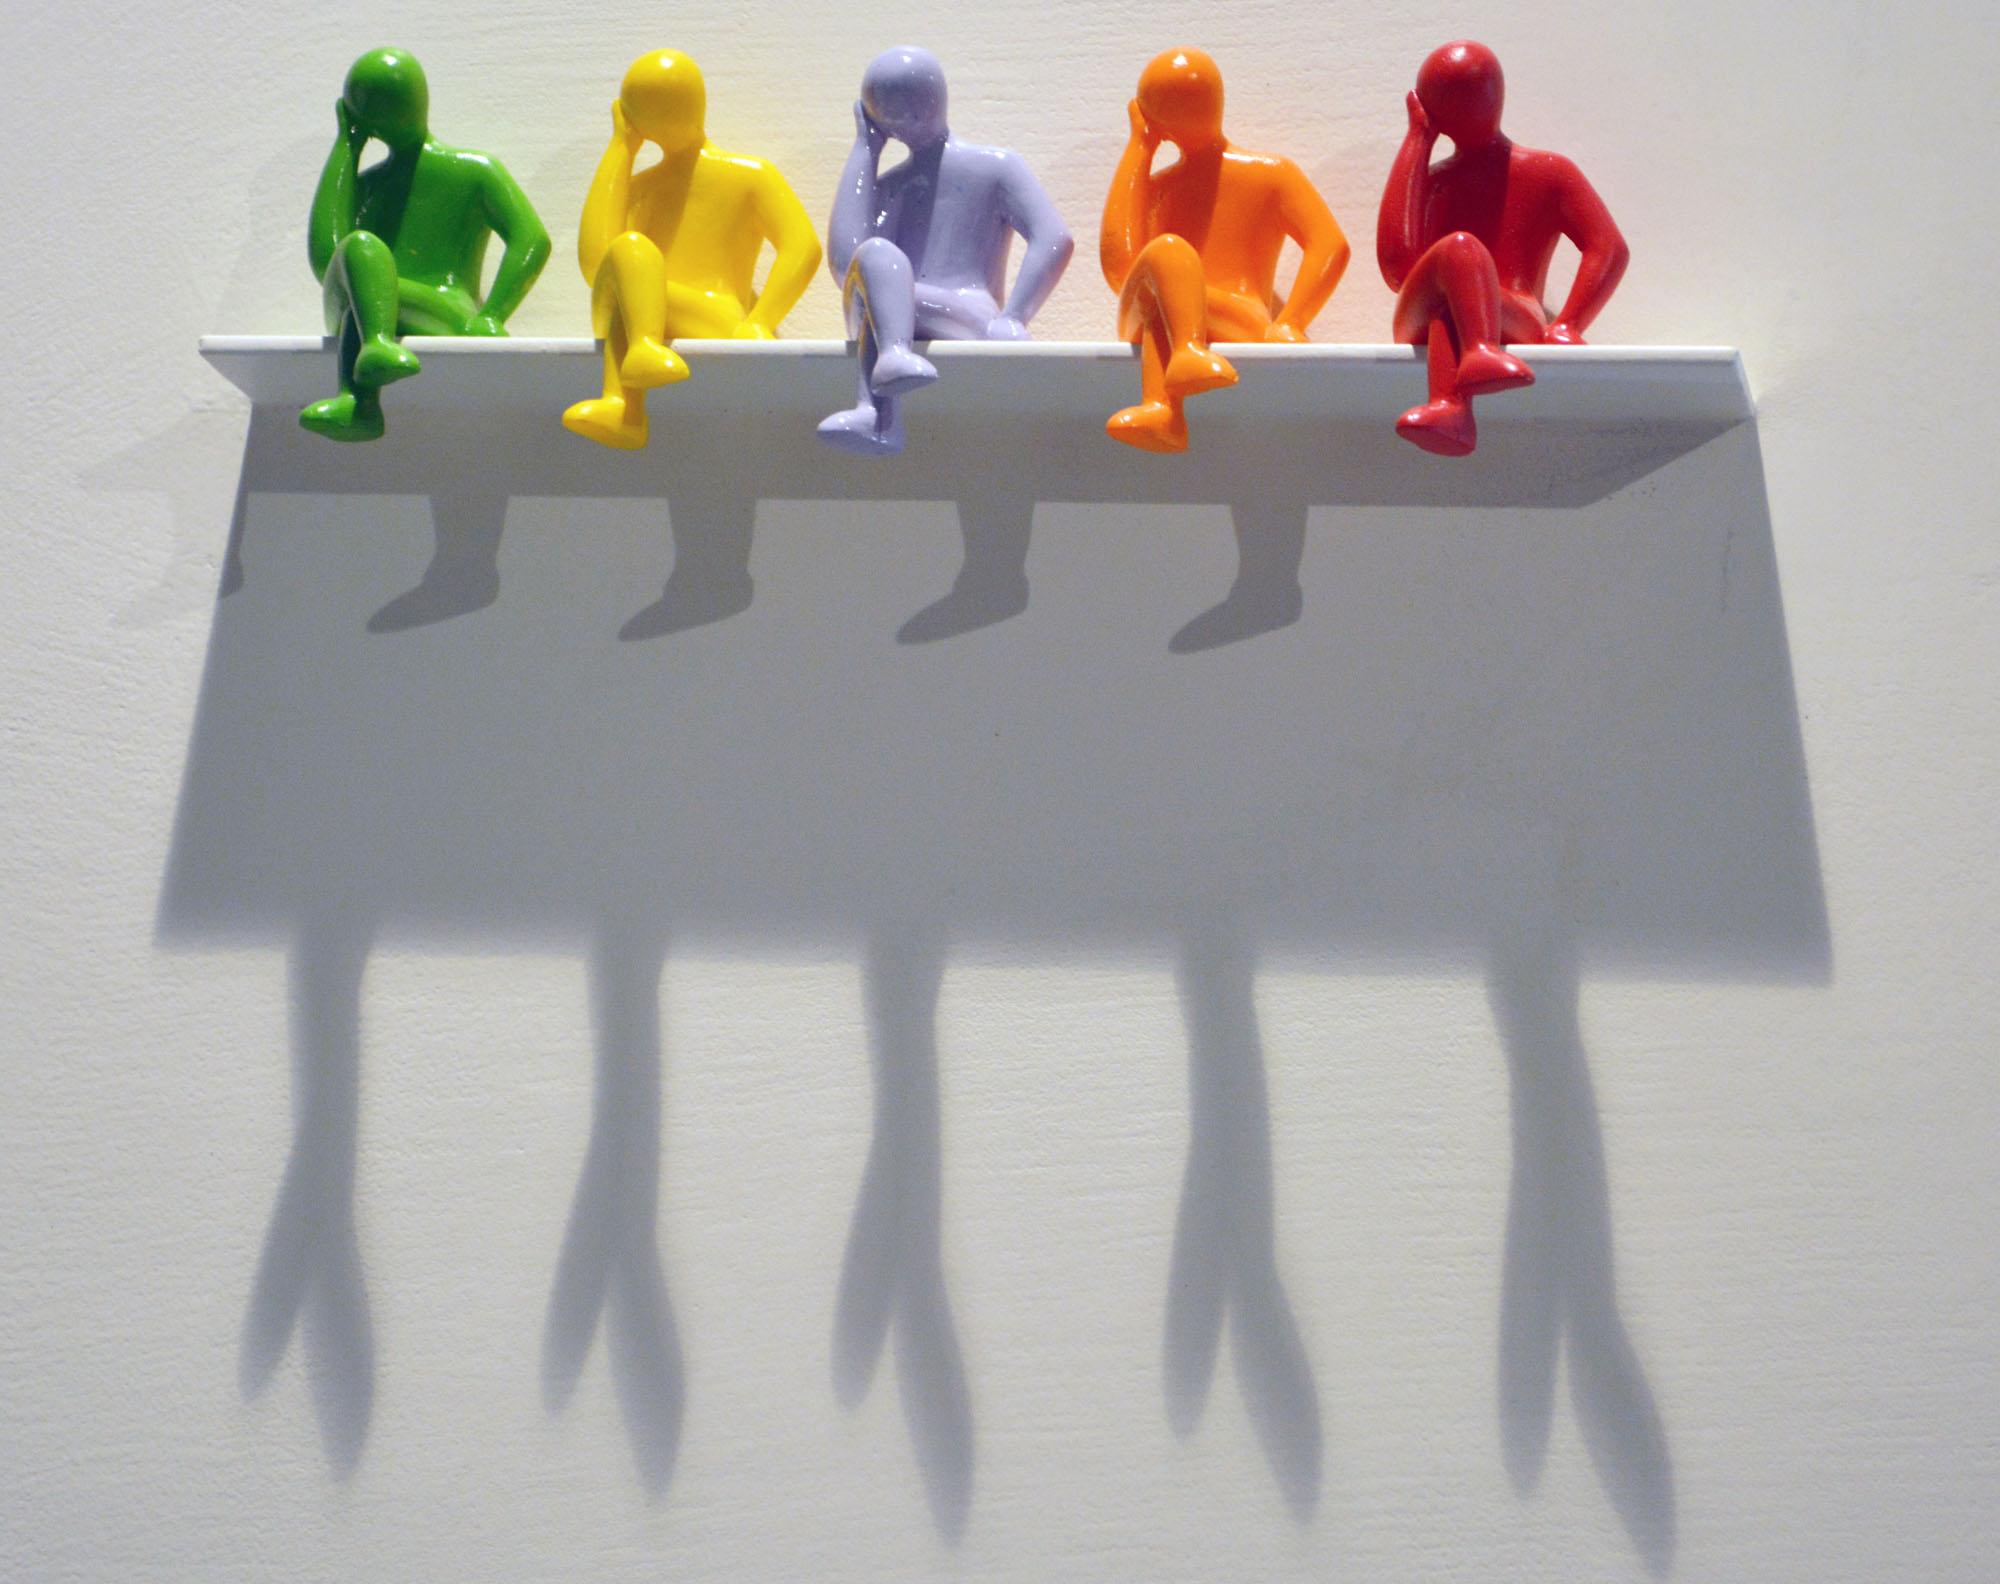 Maurizio Balducci Artista Contemporaneo Panel Arts